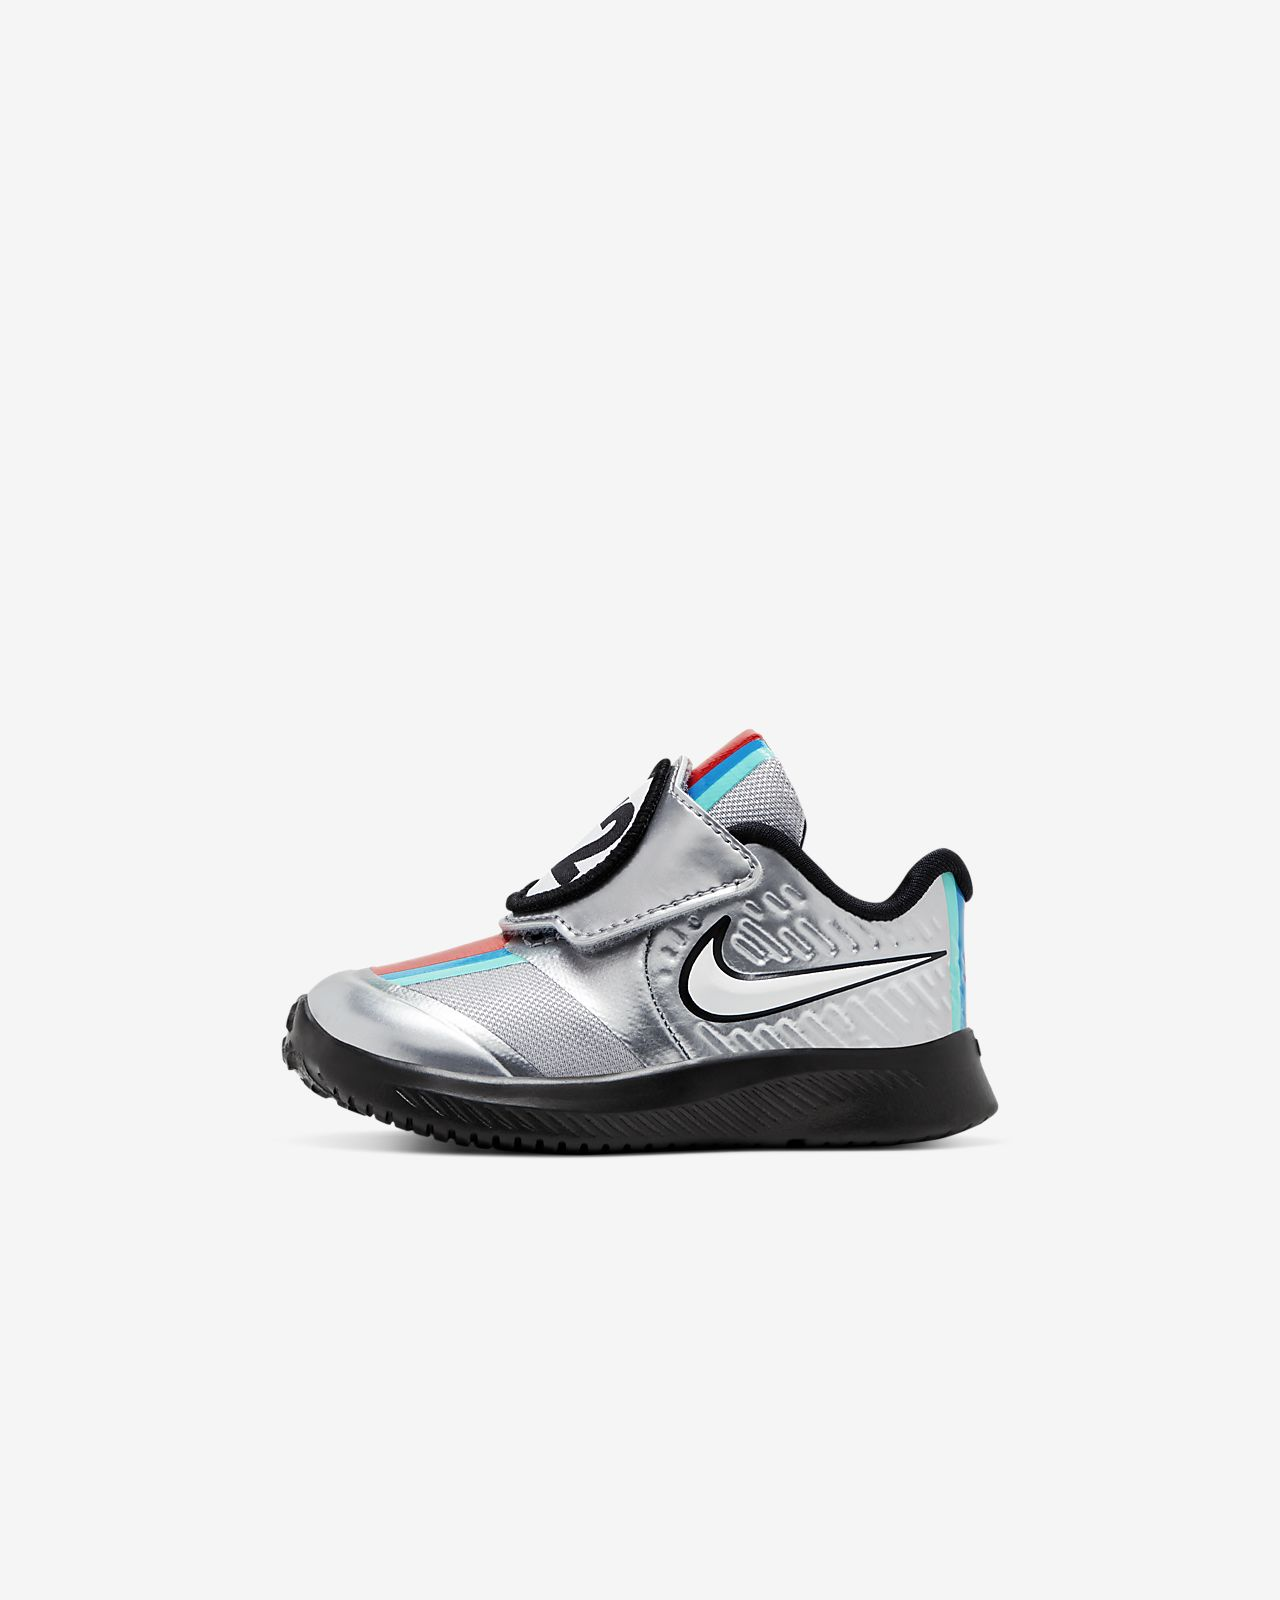 Sapatilhas Nike Star Runner 2 Auto para bebé